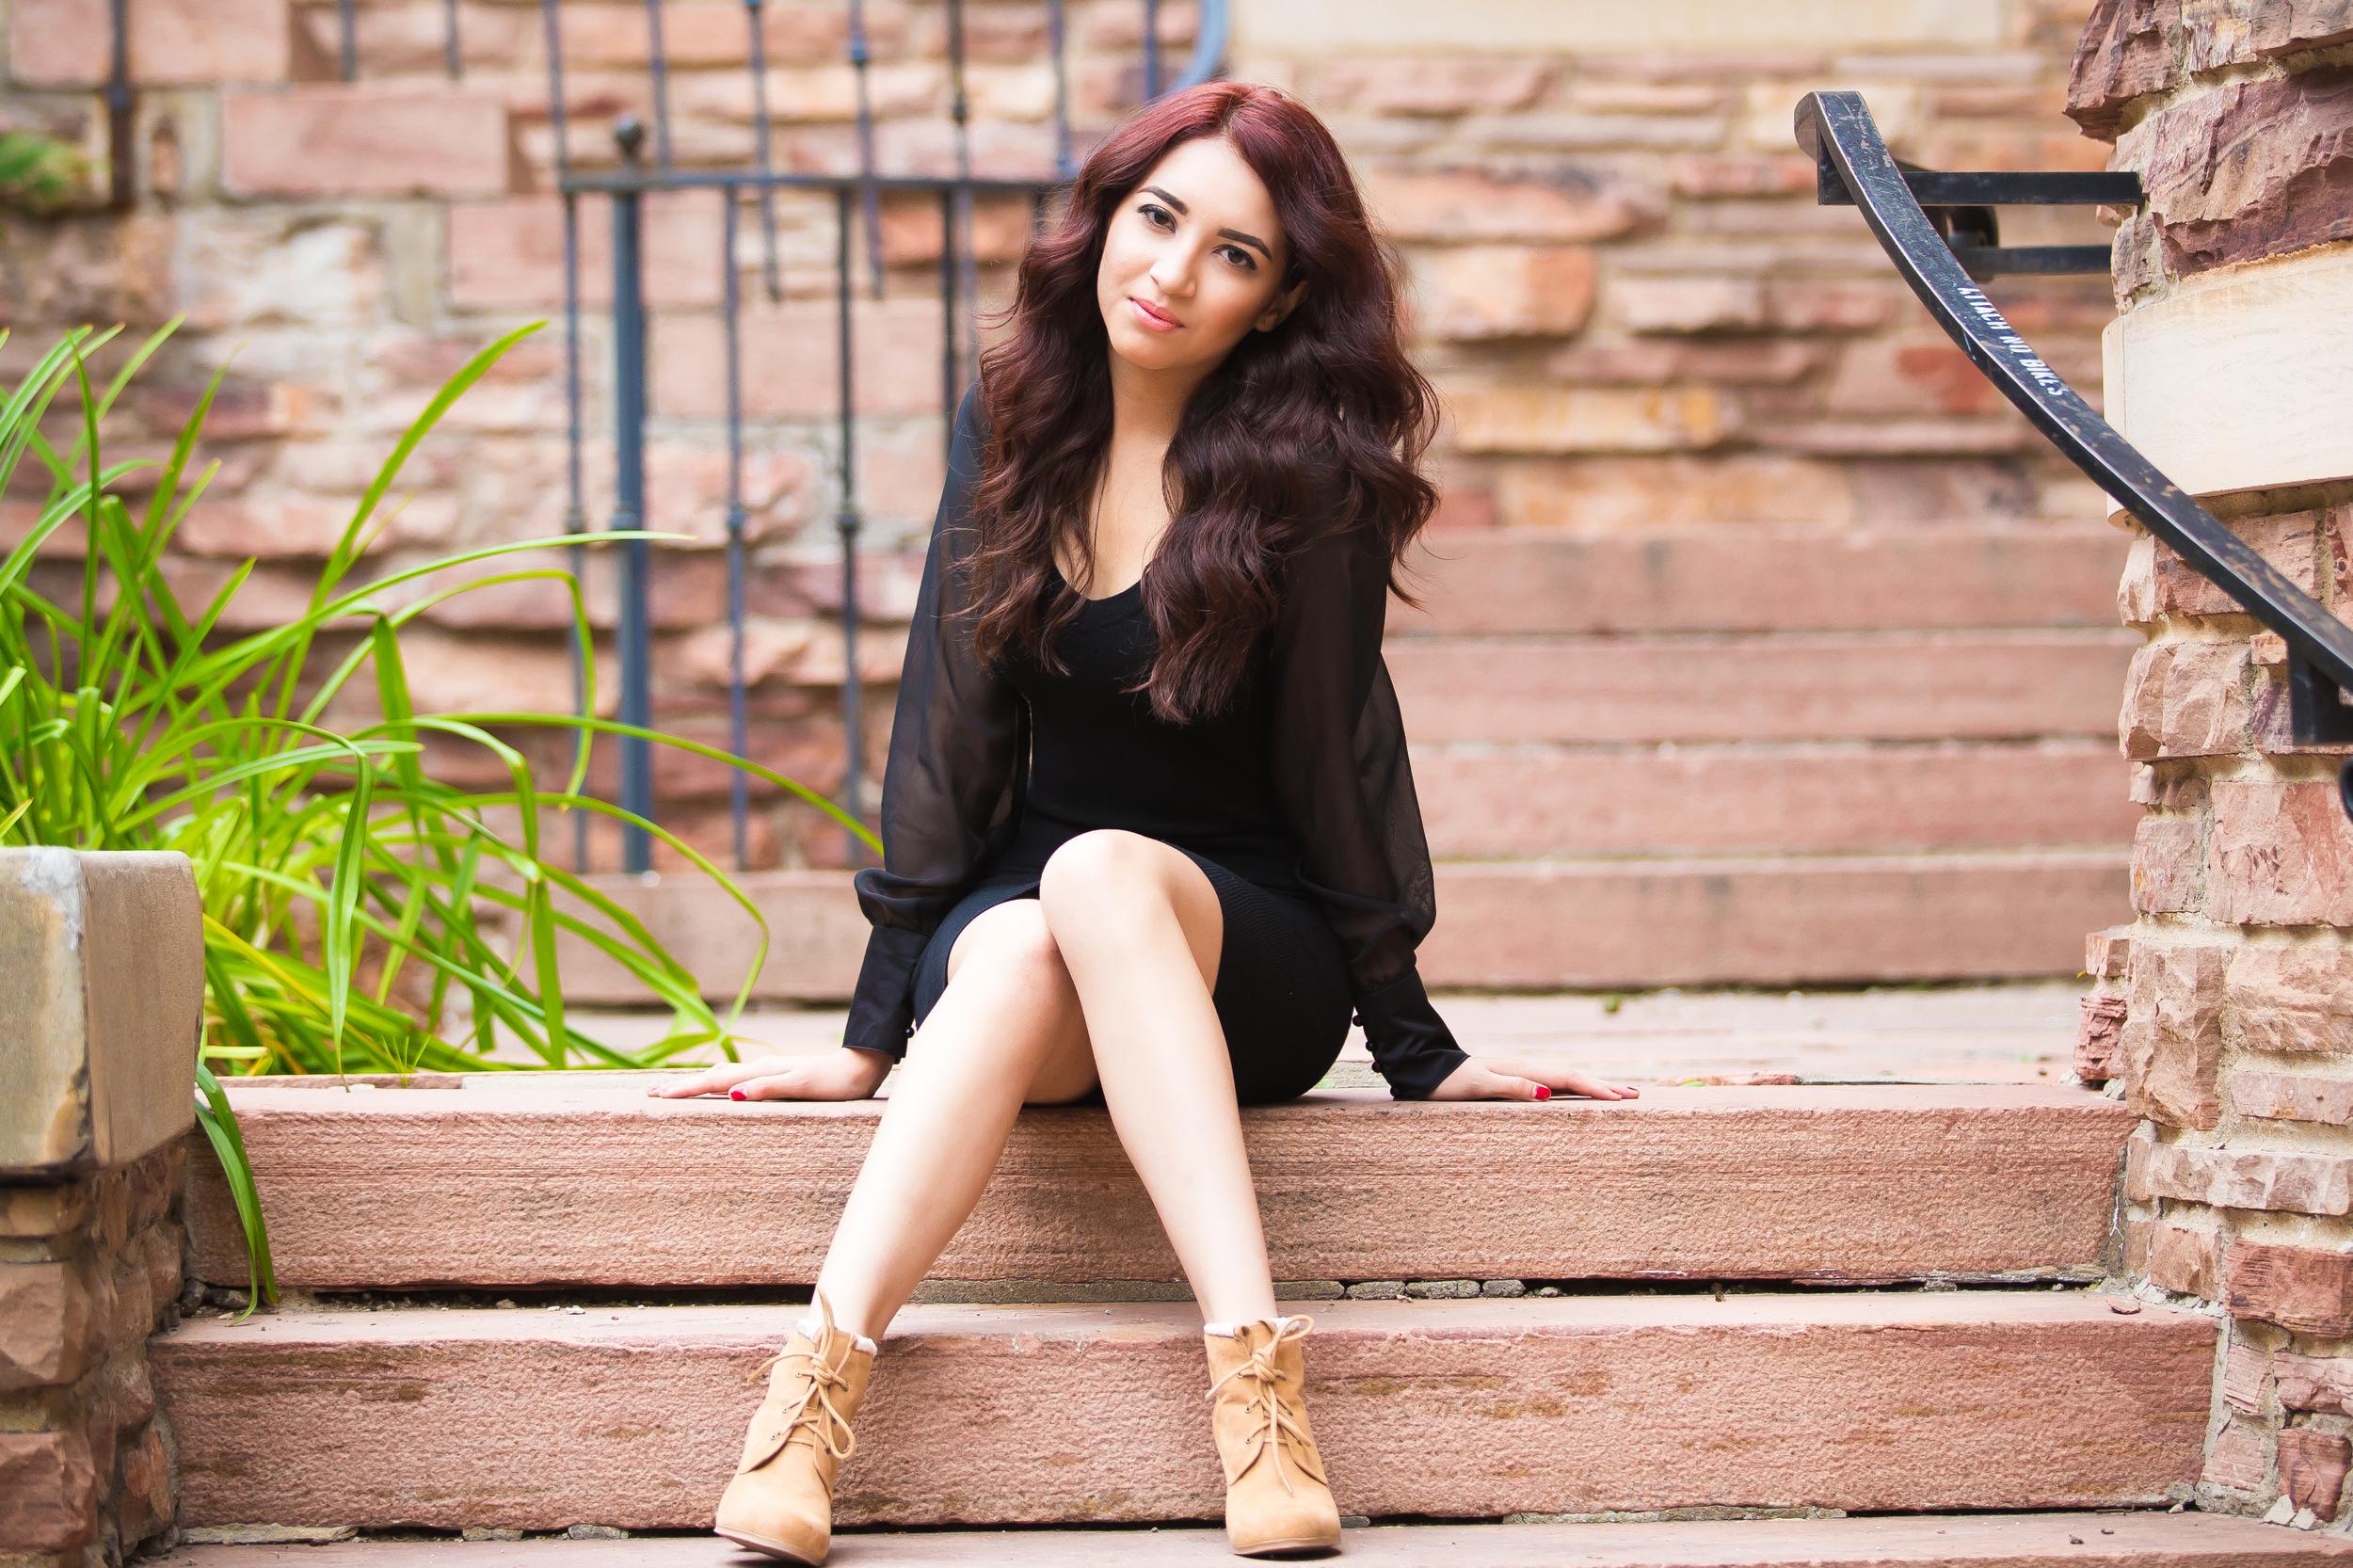 Michelle+Bustos_Think+Darryl+Photography_Denver+Senior+Portrait+Photographer+-1.jpg